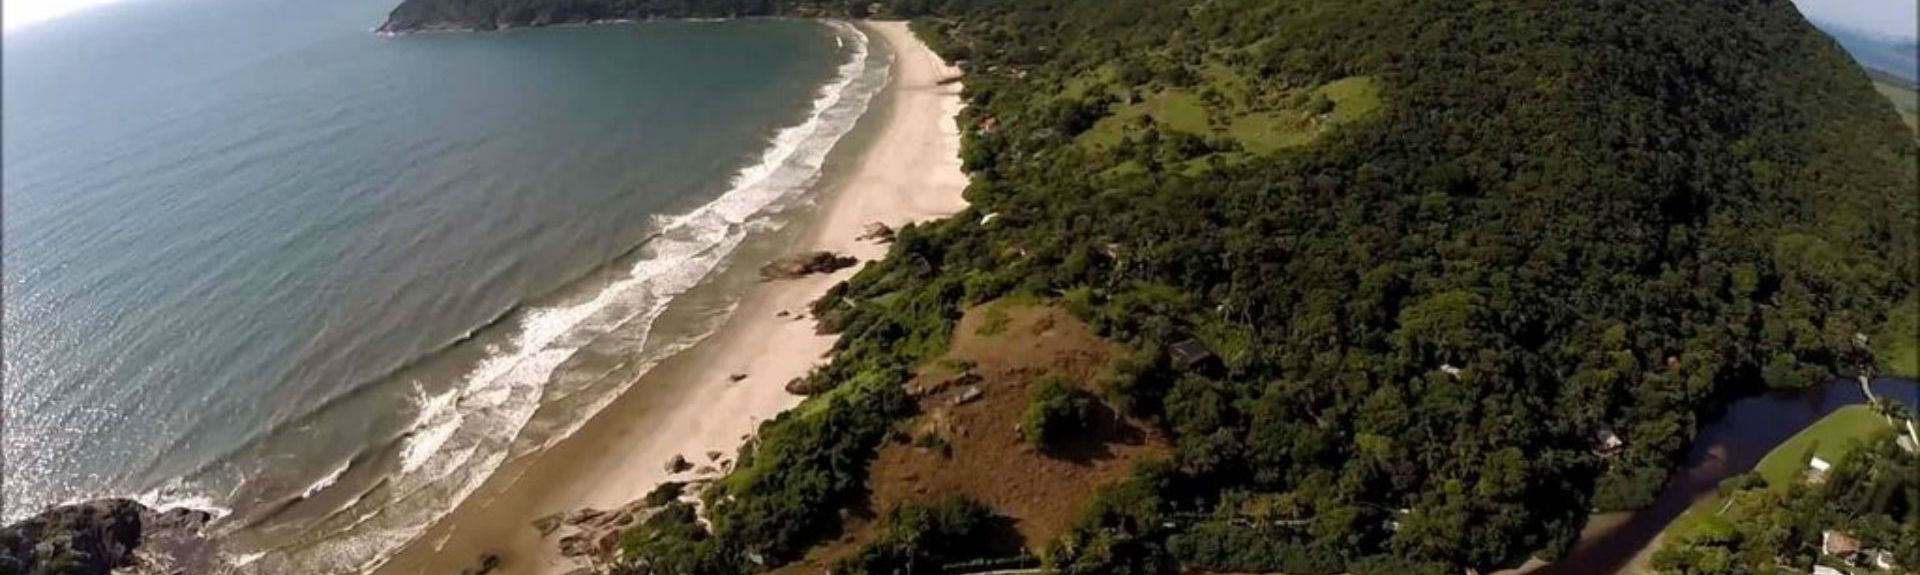 Pântano do Sul Distrito, Florianópolis, State of Santa Catarina, BR